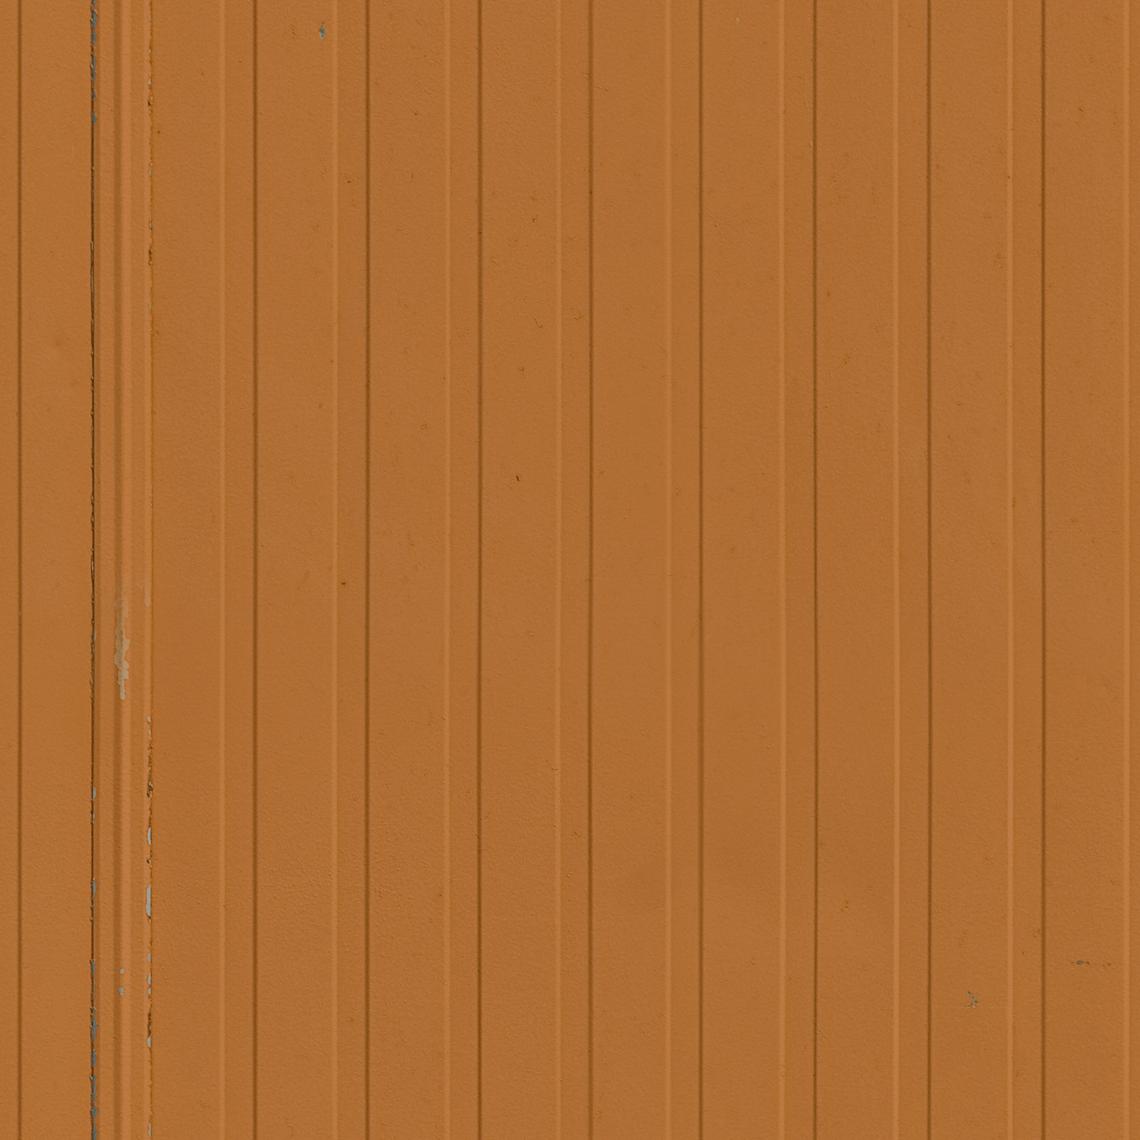 Corrugated-Metal-01-Albedo